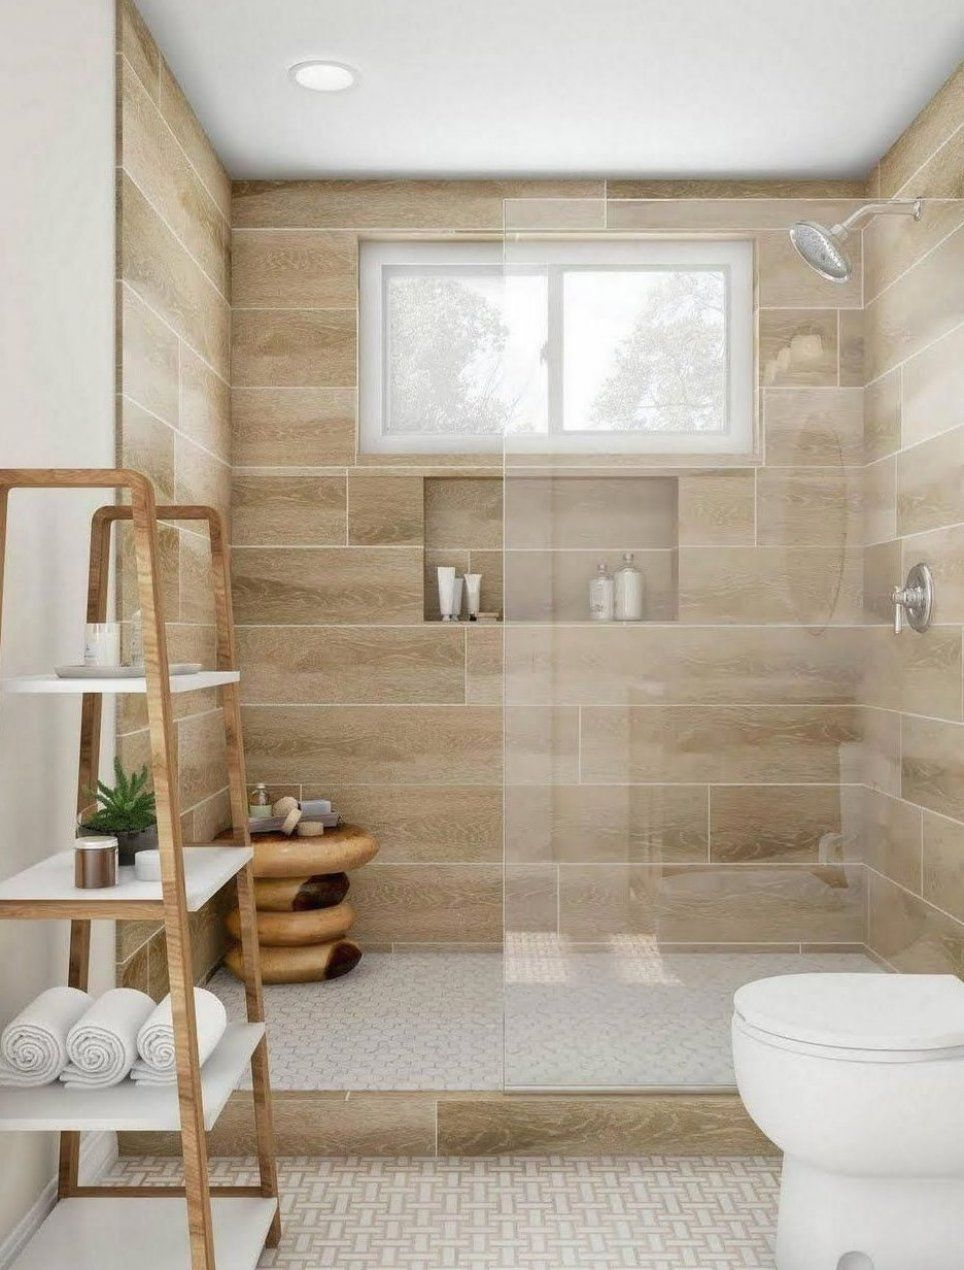 Shop Our Bathroom Department To Customize Your Warm Toned Walk In Spa Shower Today At The Home De In 2020 Badezimmer Renovieren Kleines Bad Mit Dusche Luxusbadezimmer